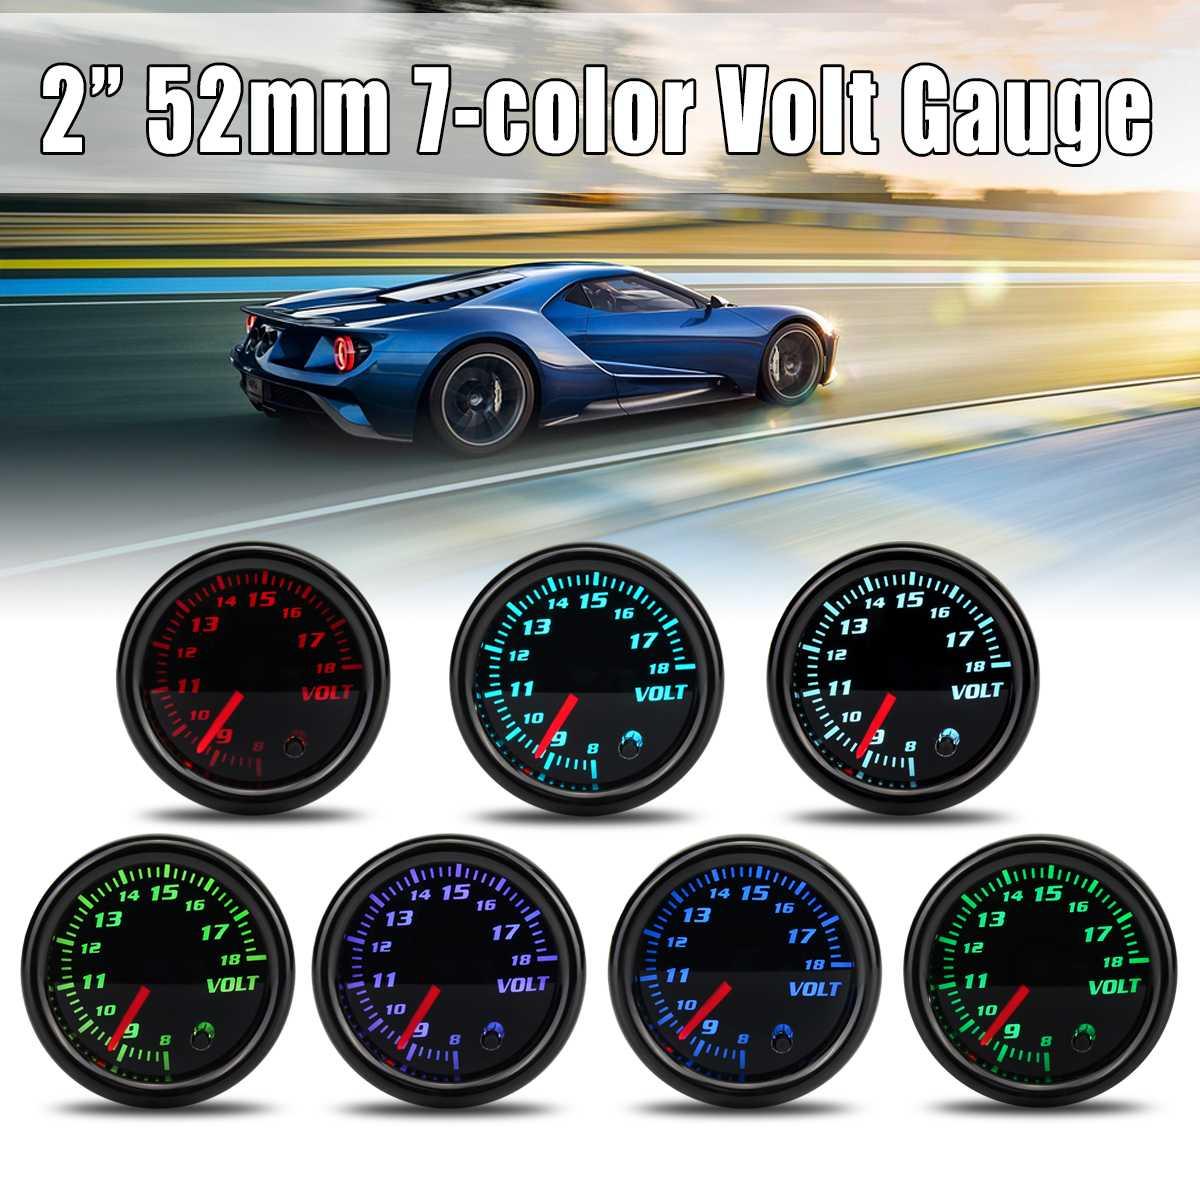 12V Universal 2inch 52mm Auto Volt Voltage Gauge Meter 7 Color LED Display Tinted Face12V Universal 2inch 52mm Auto Volt Voltage Gauge Meter 7 Color LED Display Tinted Face